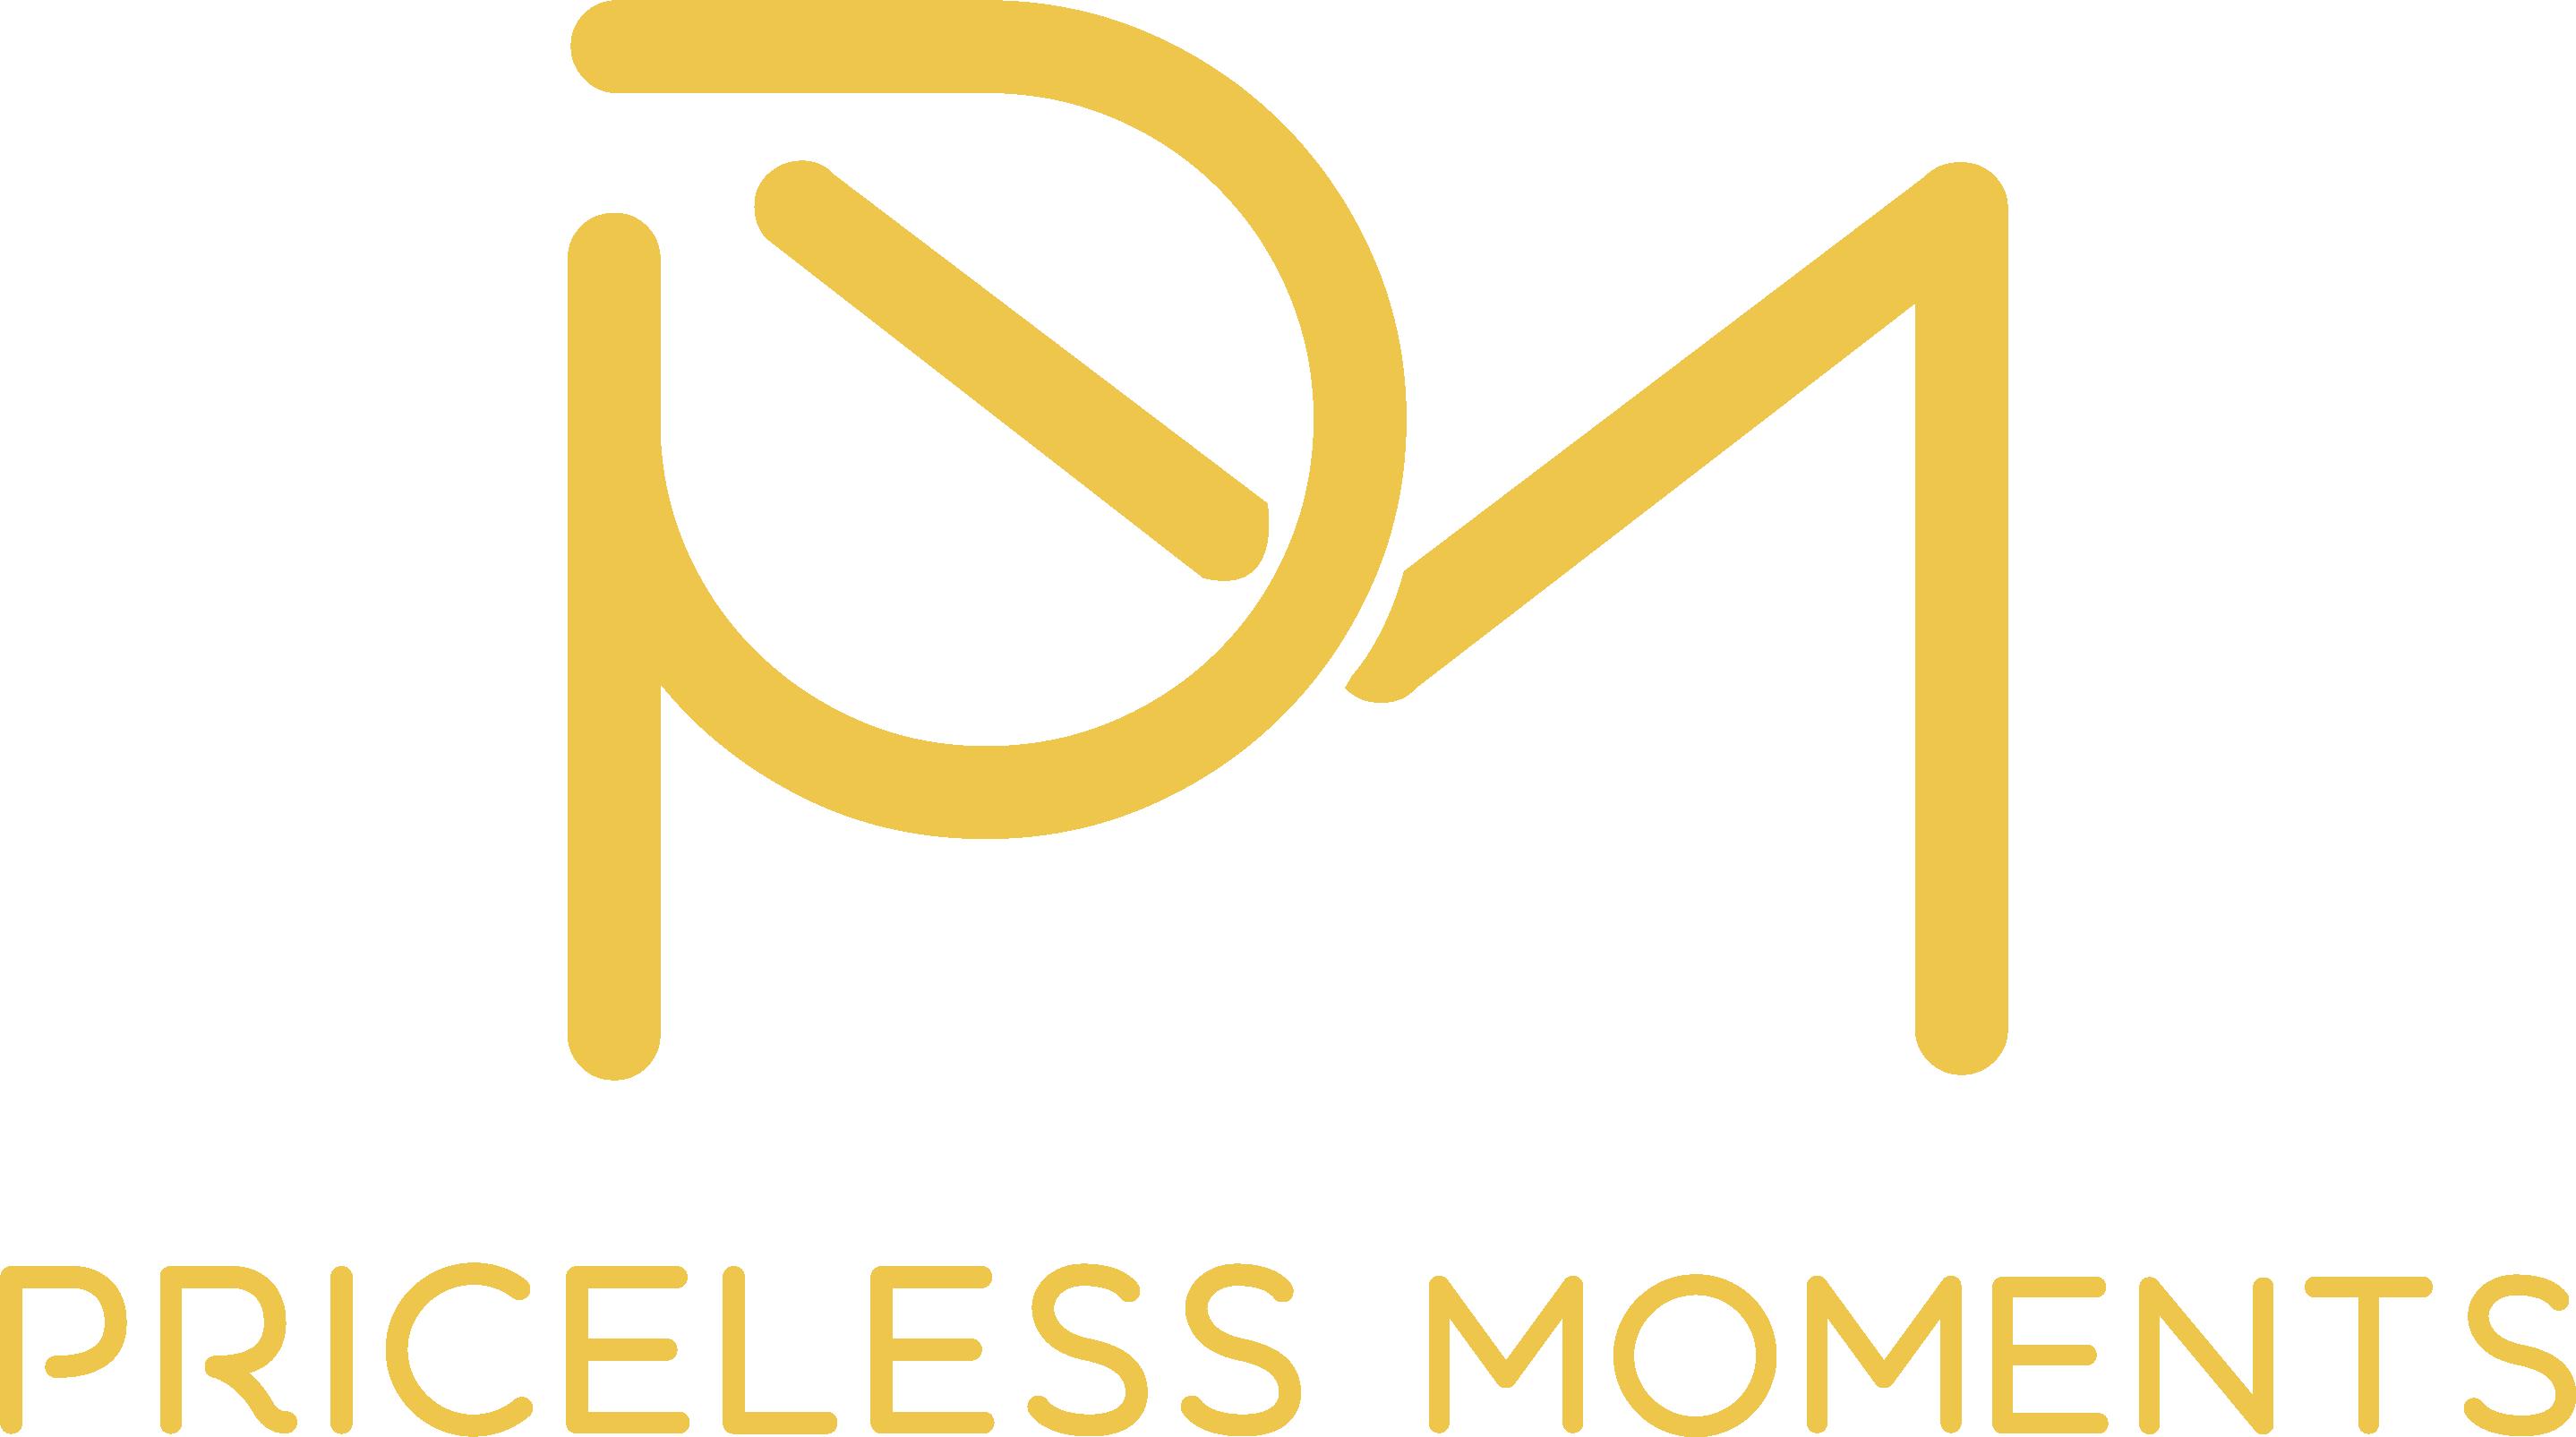 PM logo top left